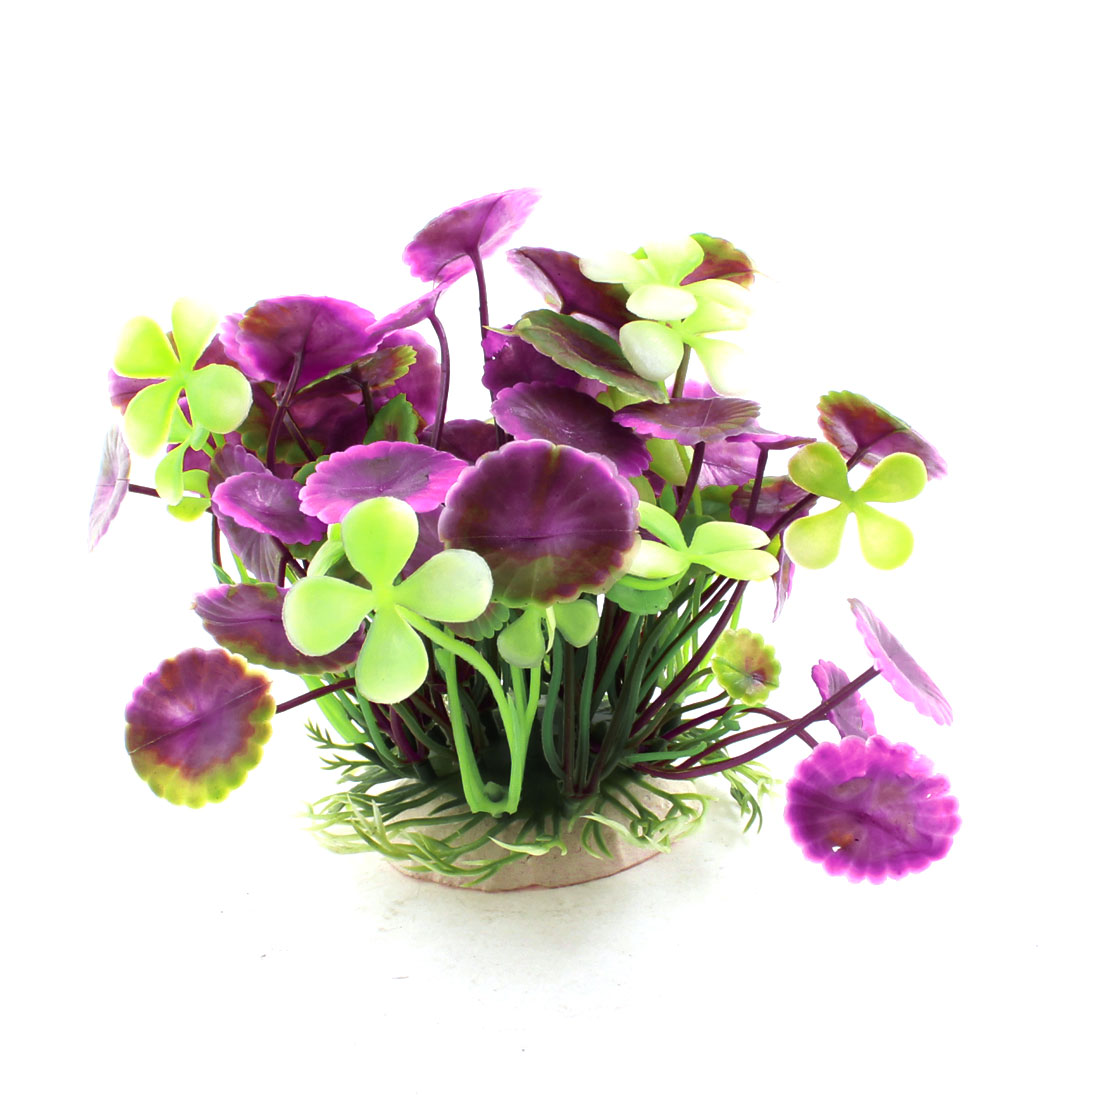 "Aquarium Purple Green Plastic Manmade Water Plants Ornament 4.7"" Height"